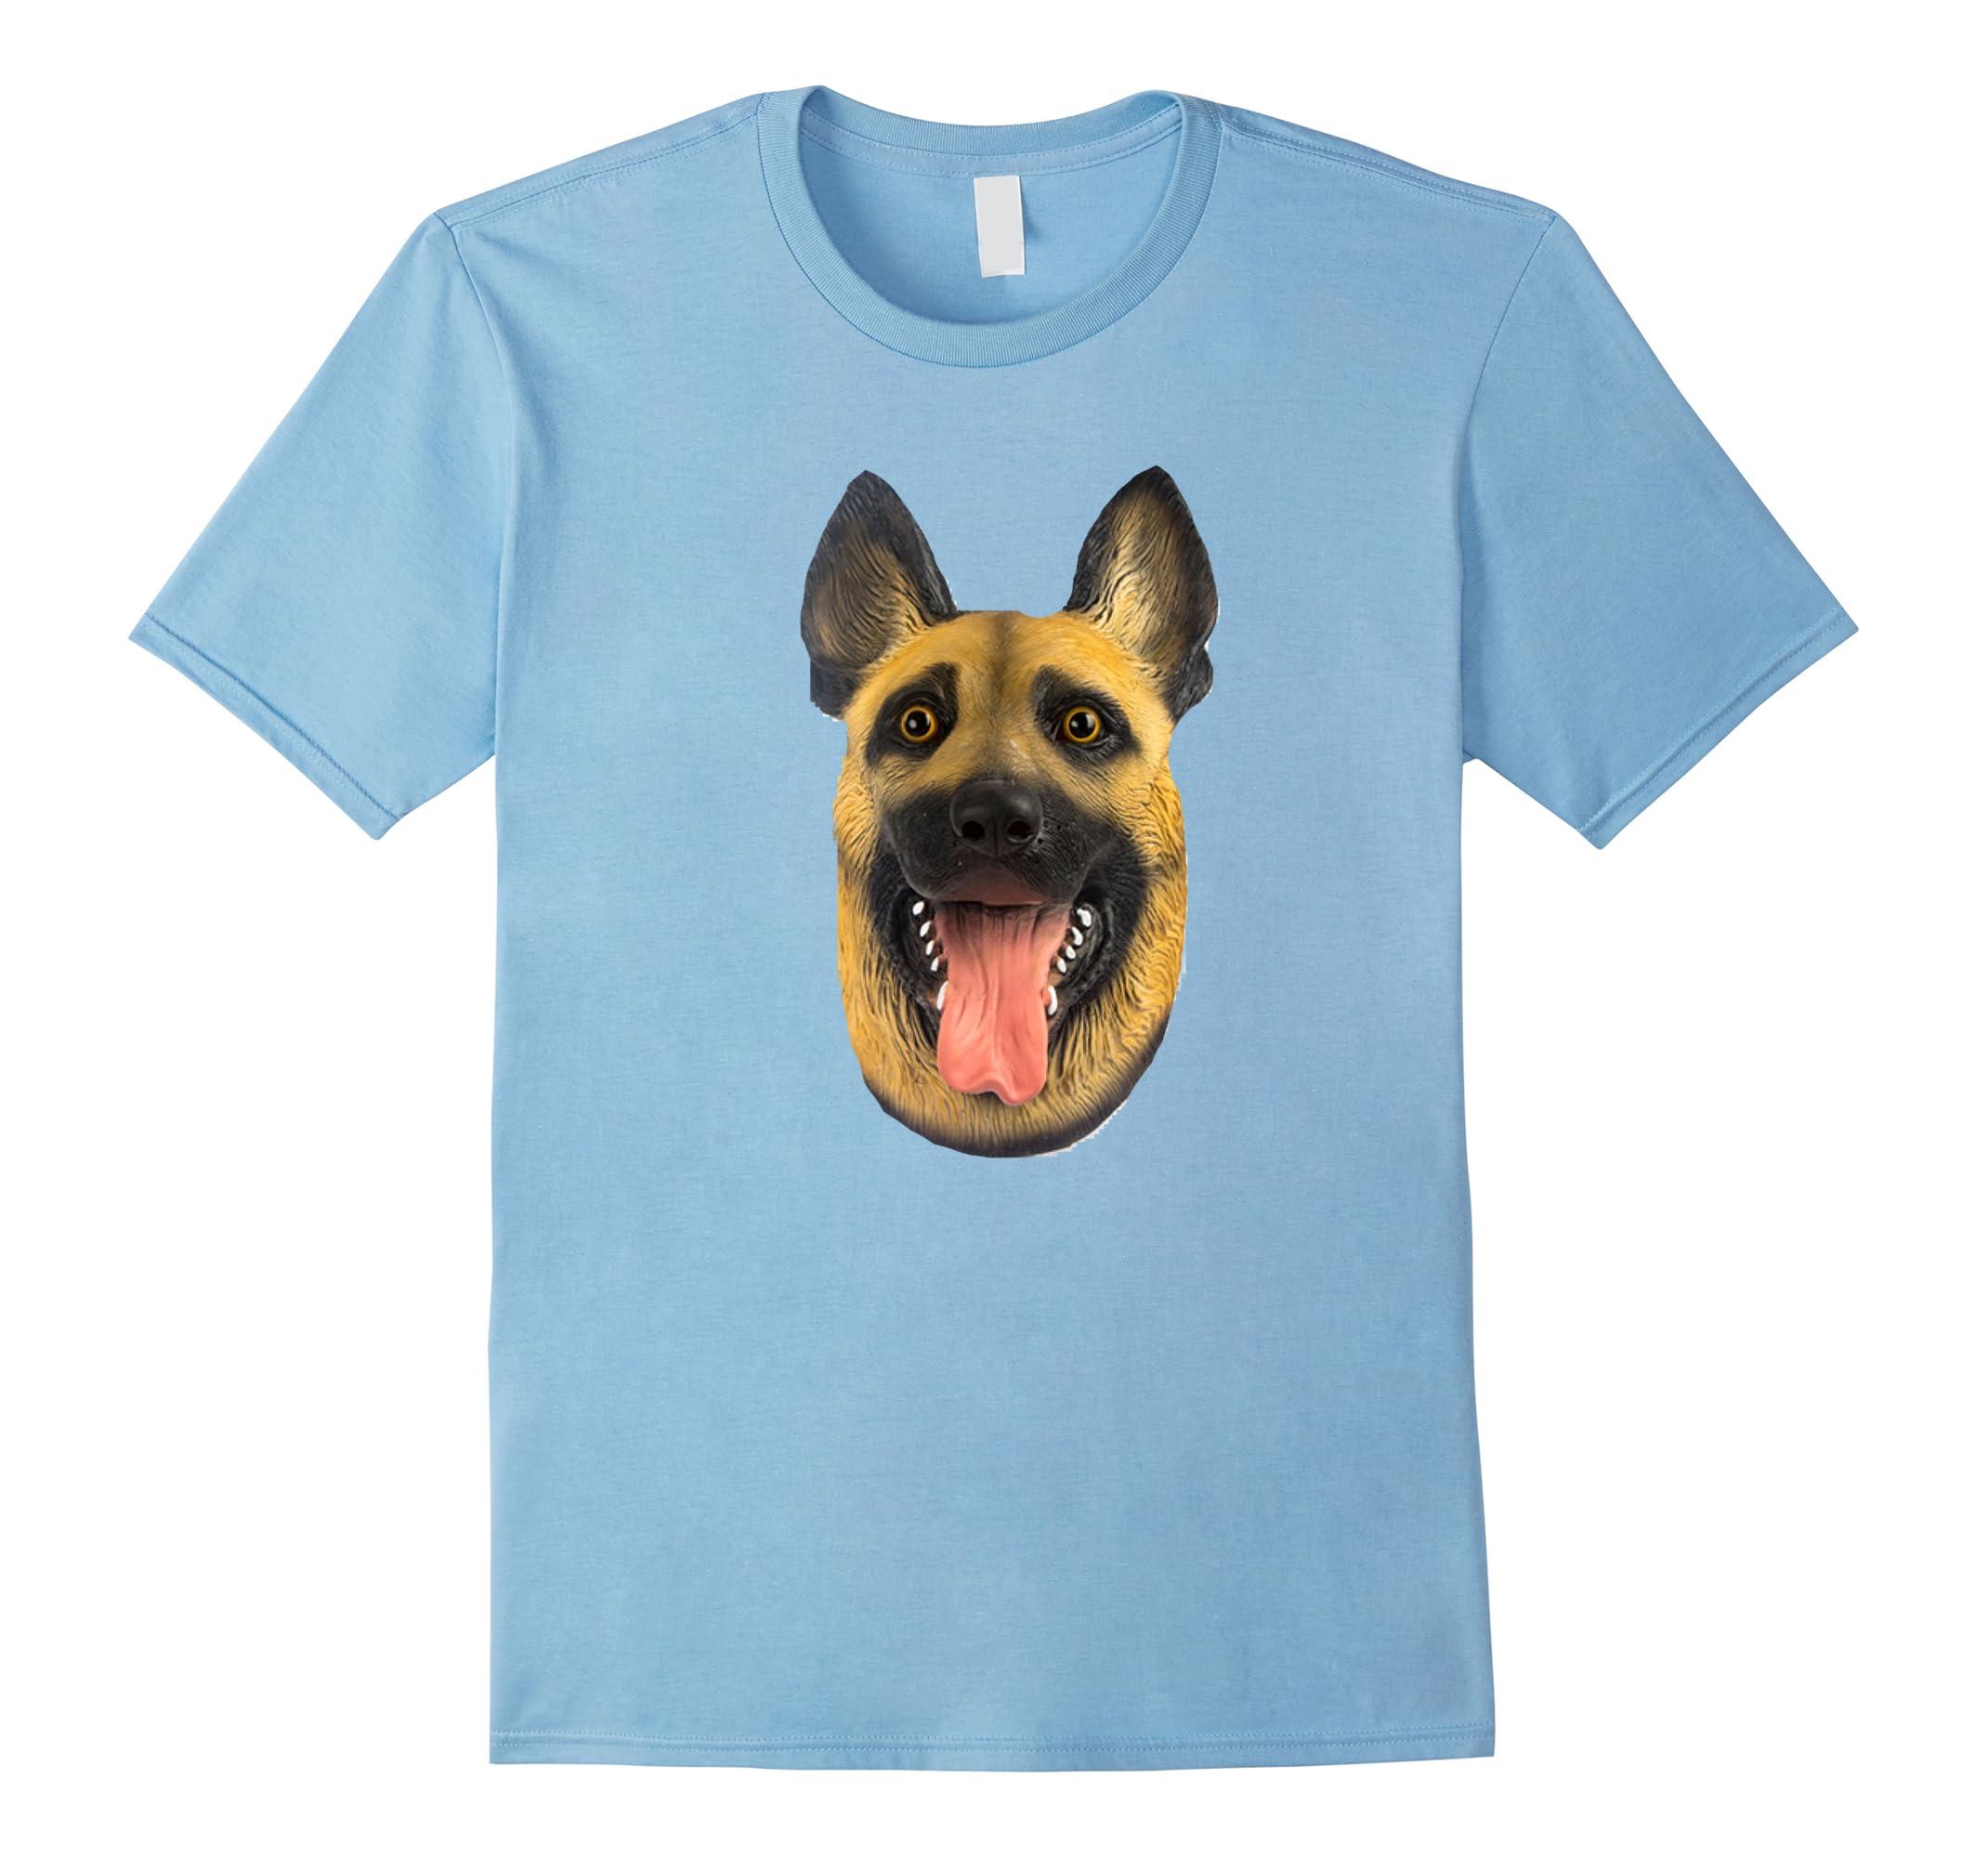 Creepy Dog Head T Shirt-ah my shirt one gift